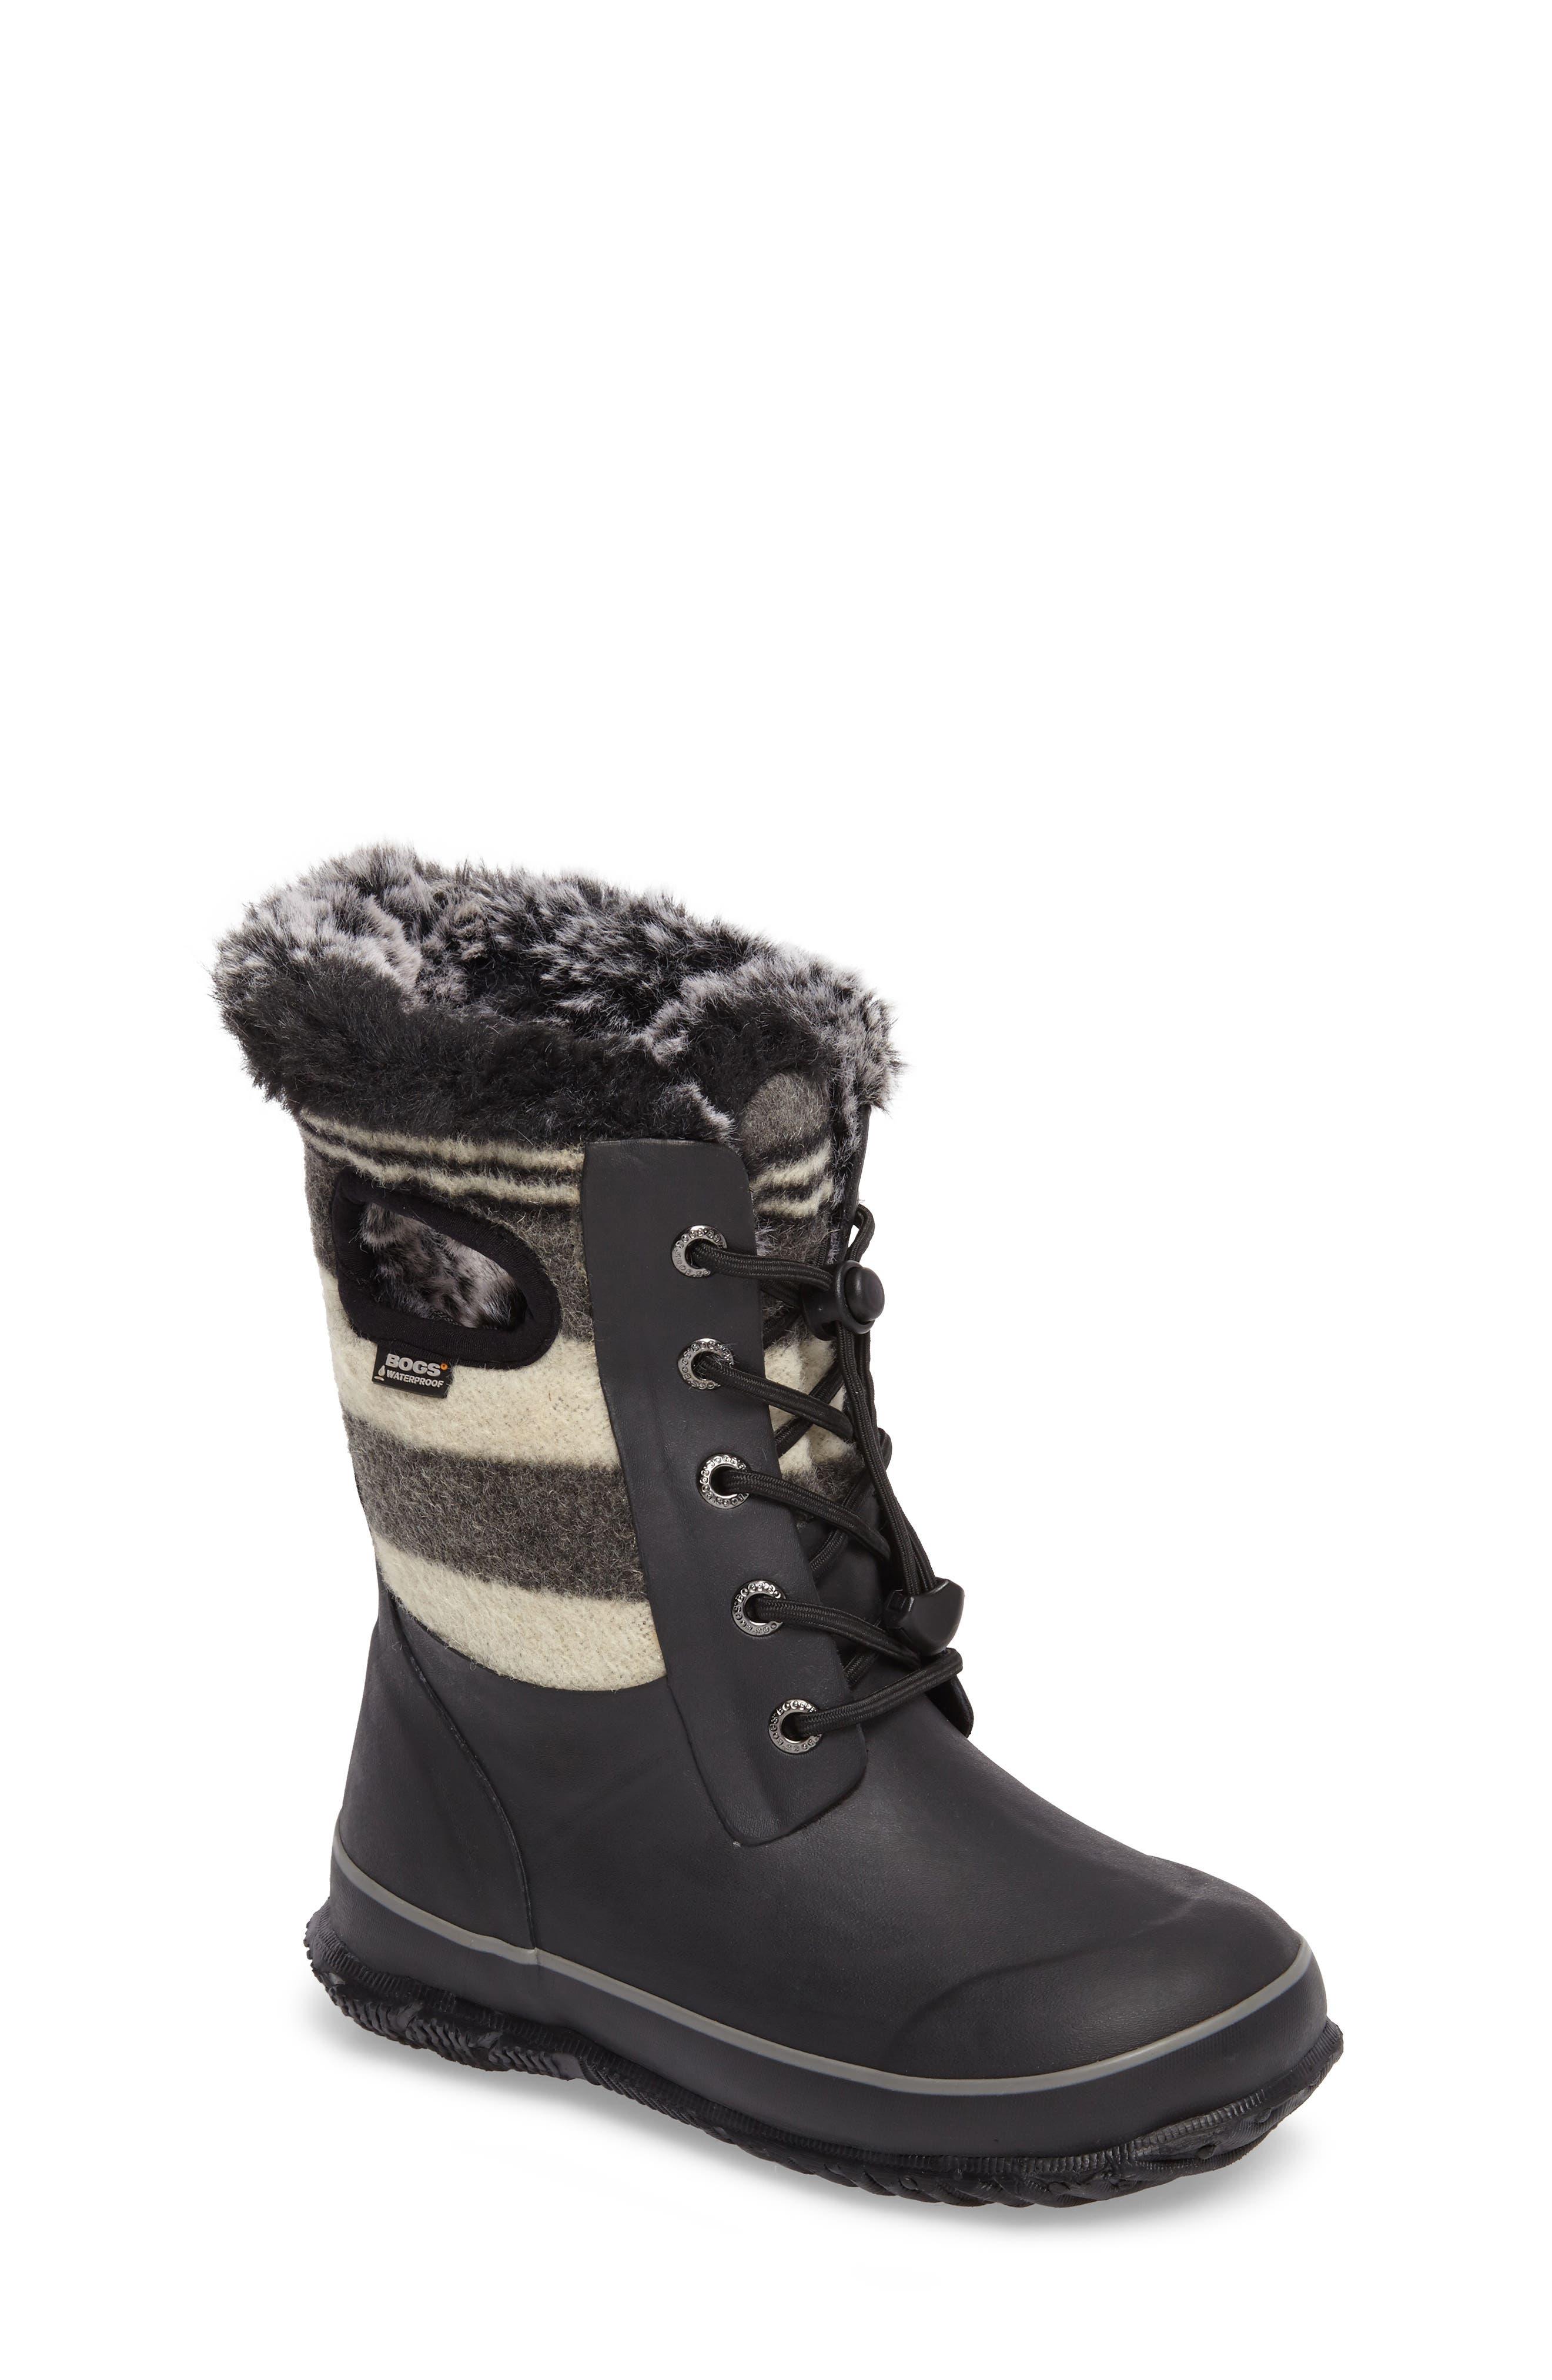 Alternate Image 1 Selected - Bogs Arcata Stripe Waterproof Insulated Faux Fur Boot (Walker, Toddler, Little Kid & Big Kid)